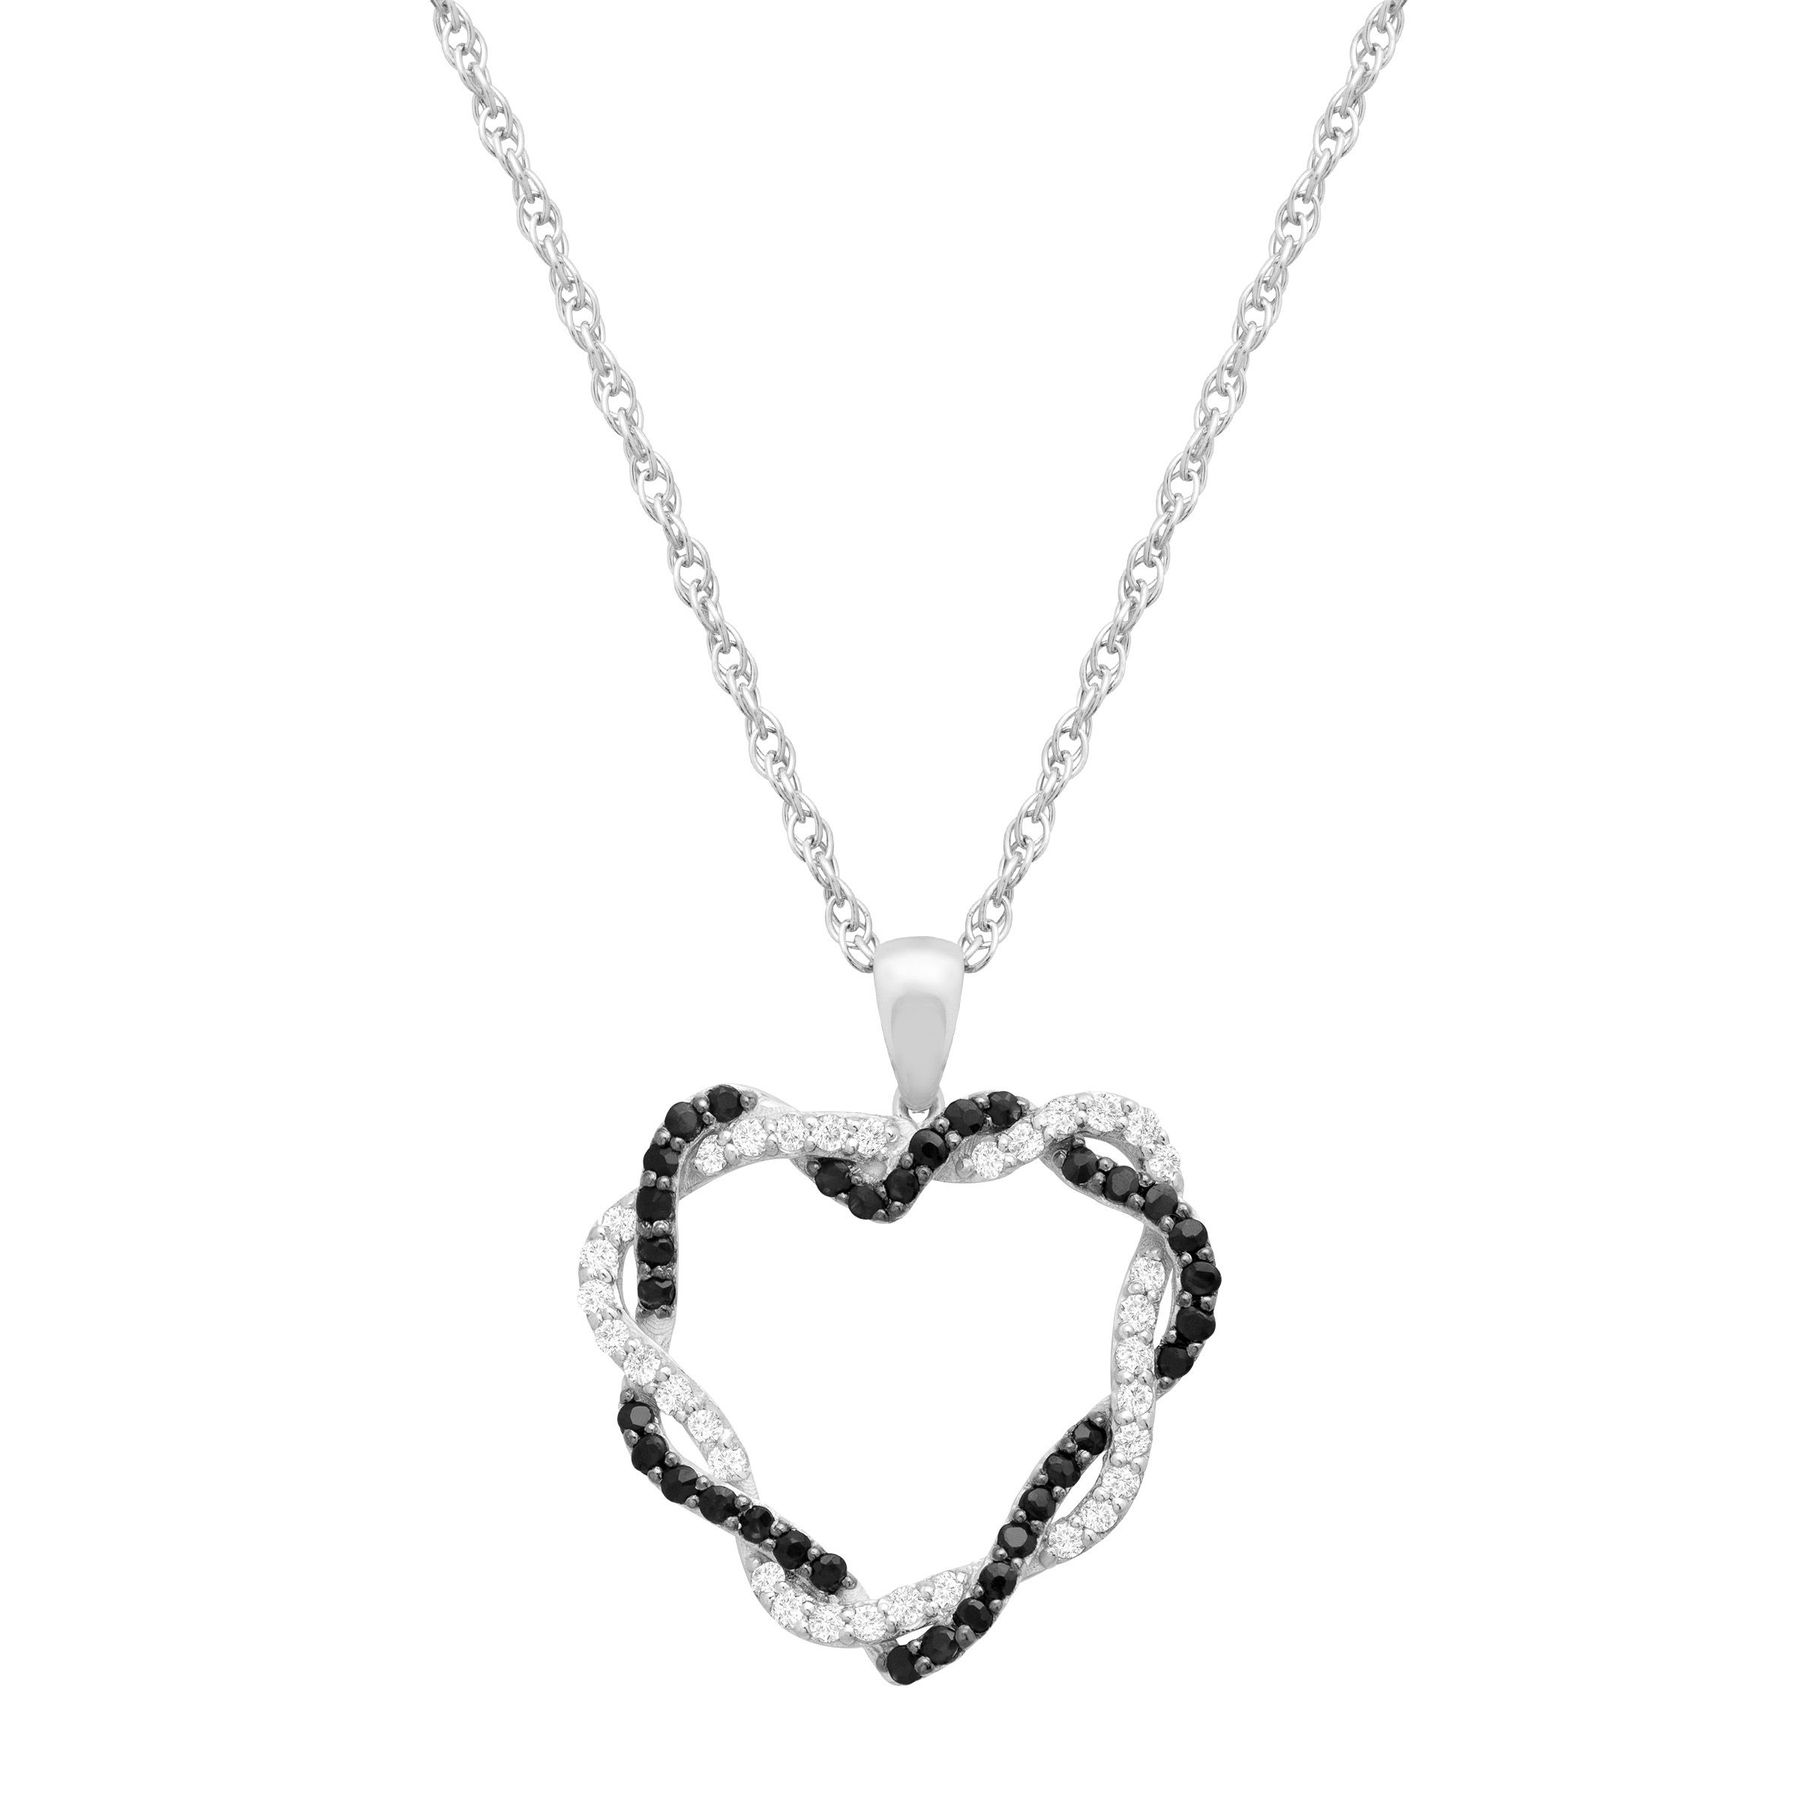 34 ct natural black white sapphire heart pendant necklace in 34 ct black white sapphire heart pendant aloadofball Images